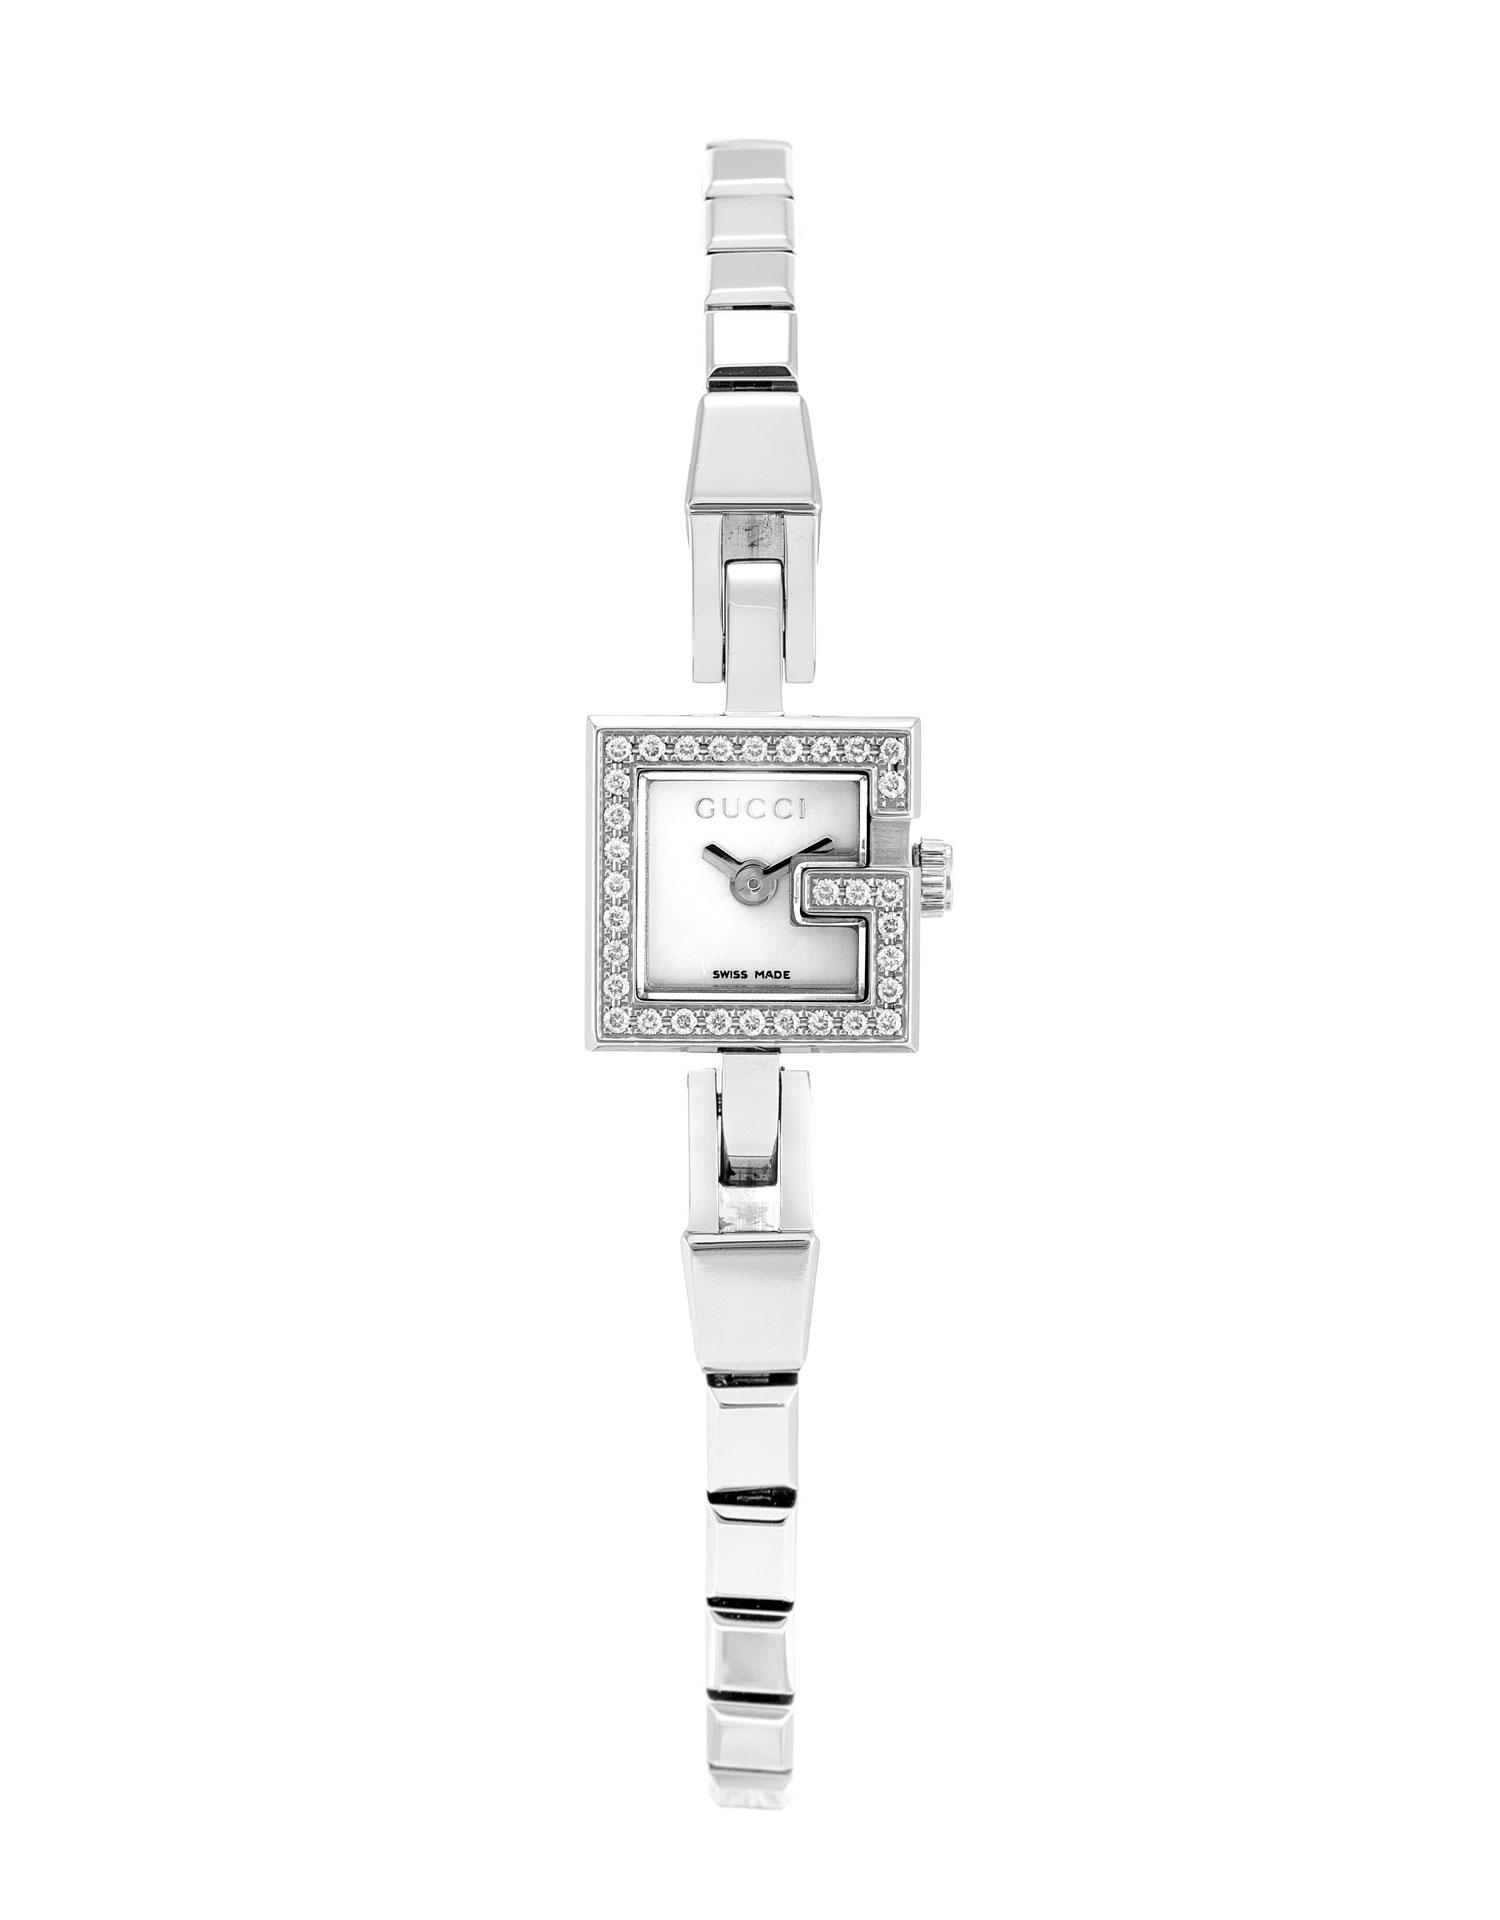 cd77e98ad9a Gucci 102 YA102541 Watch